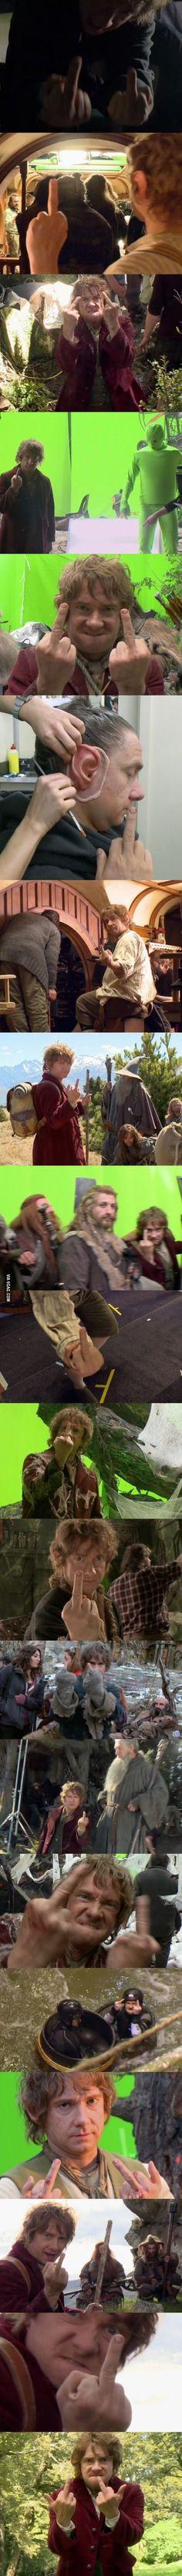 Martin Freeman is a naughty little Hobbit. <3